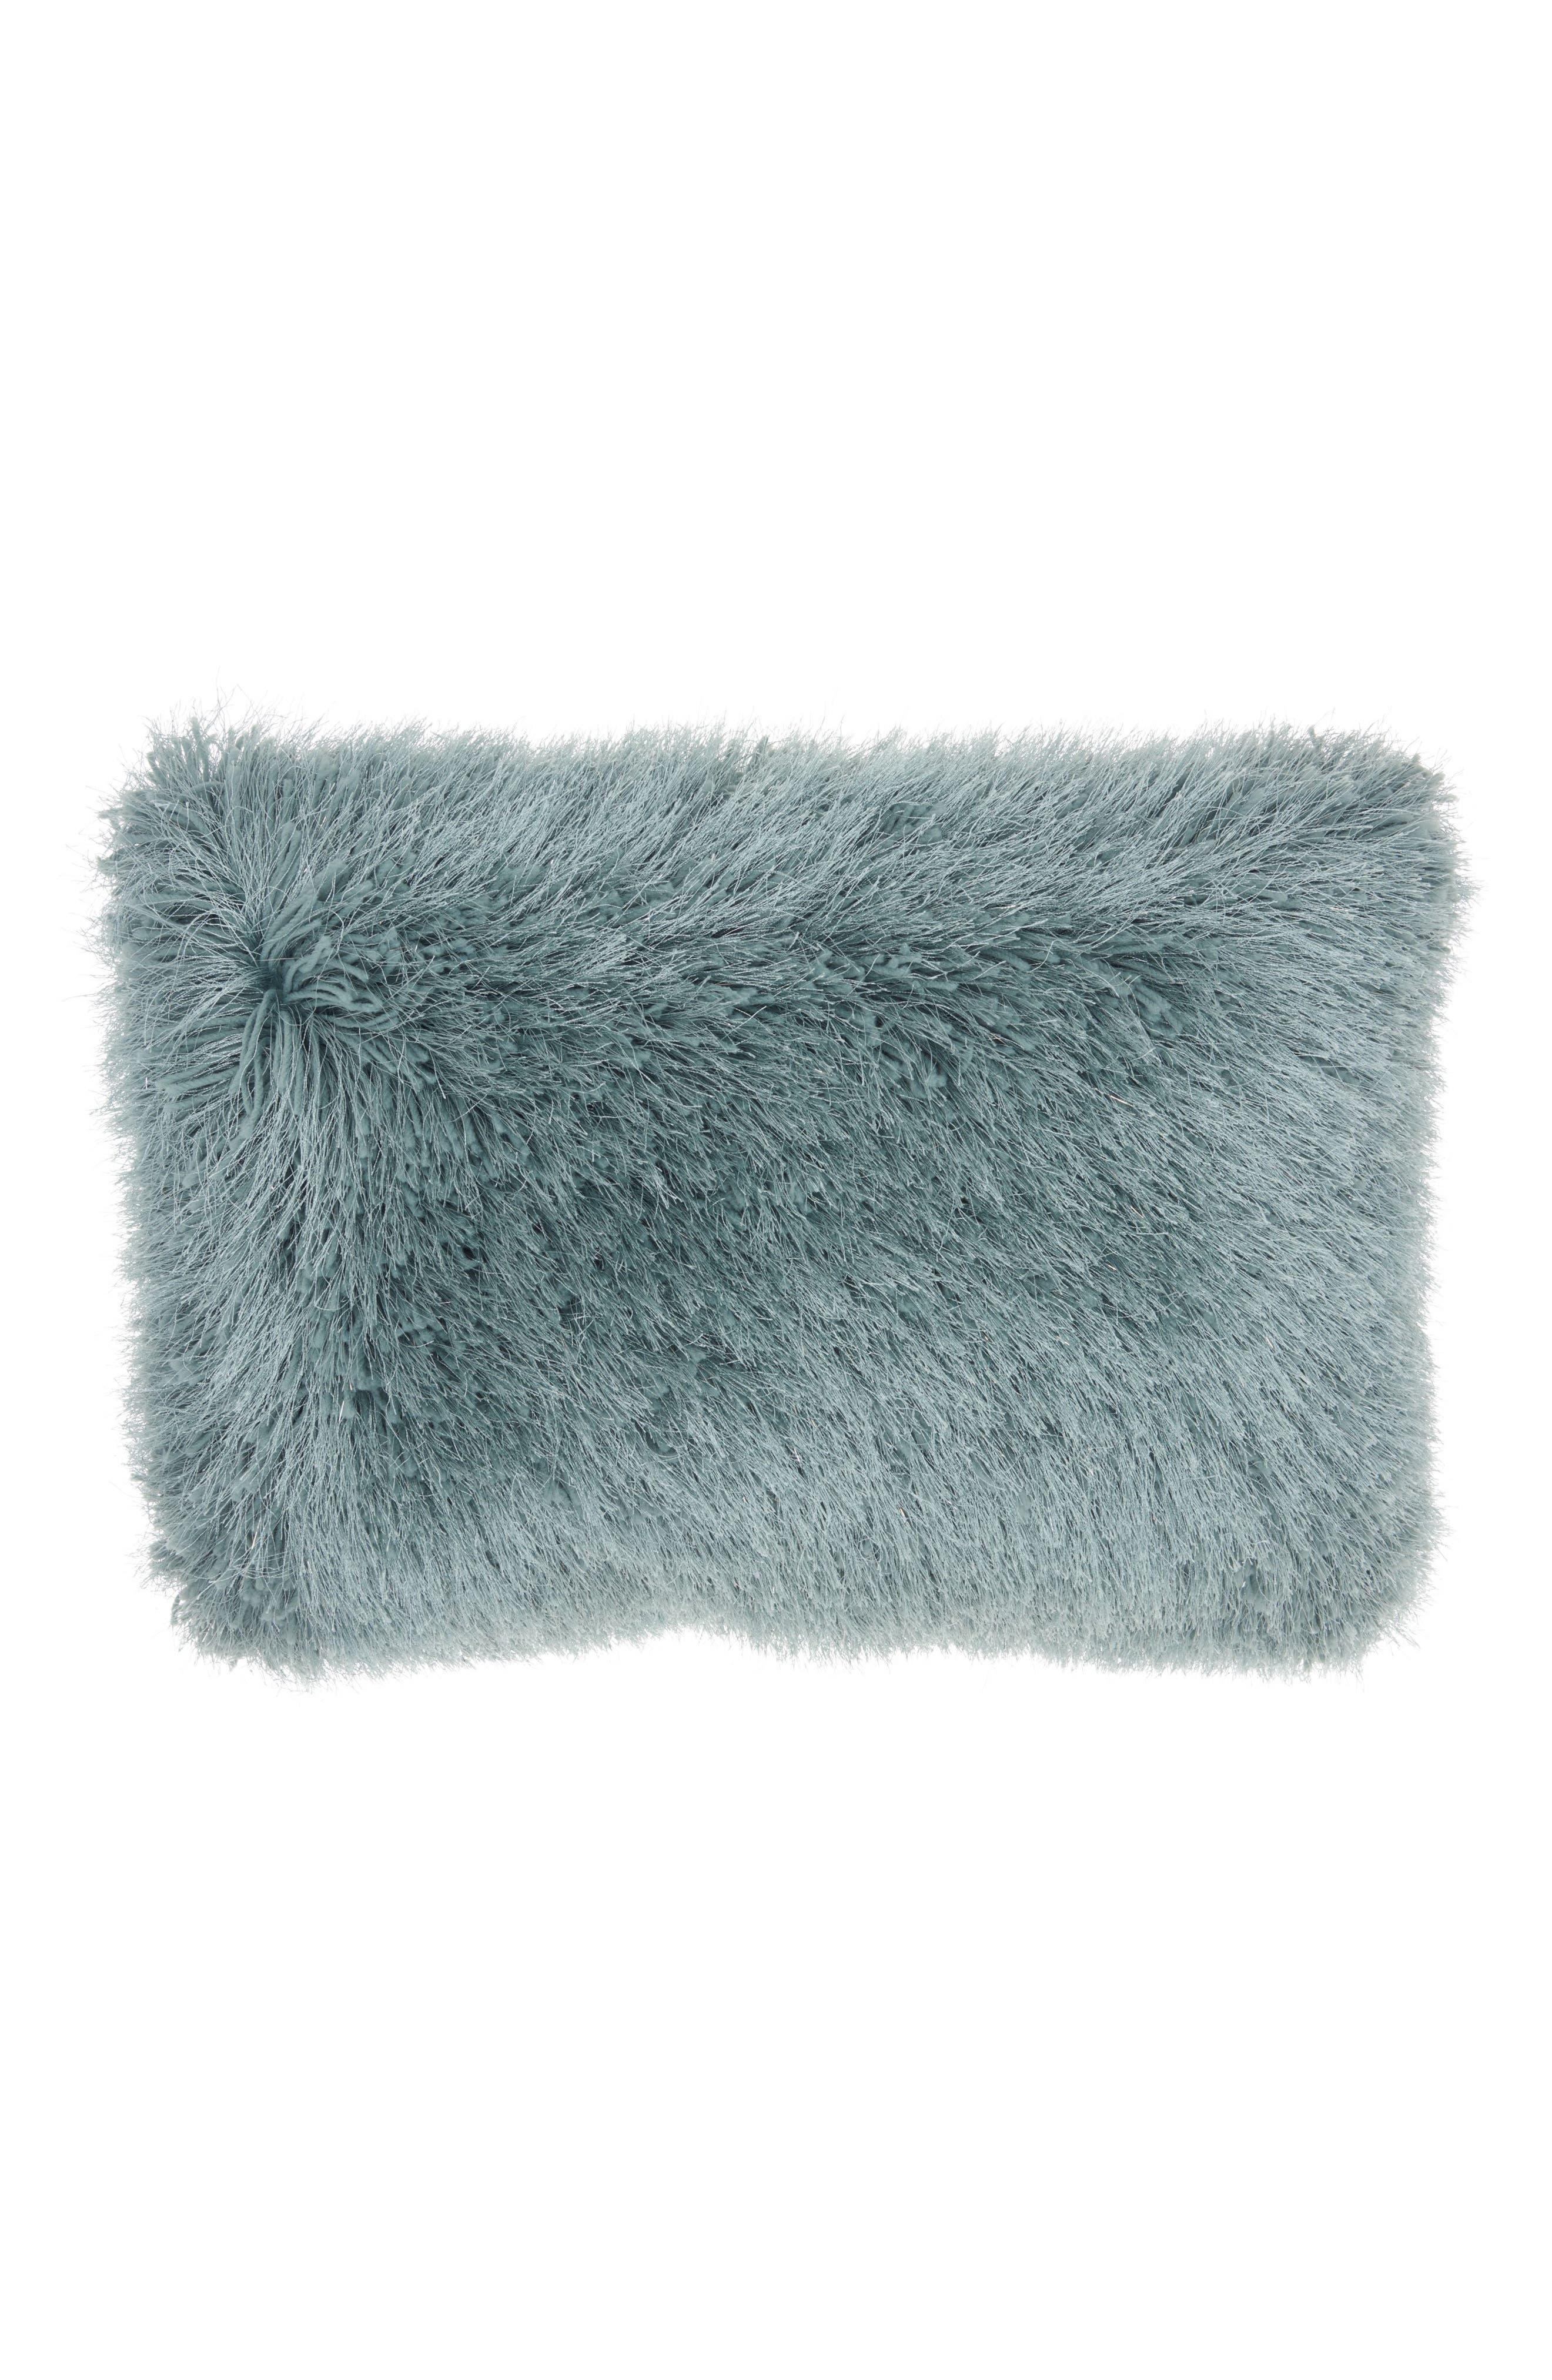 Yarn Shimmer Shag Pillow,                         Main,                         color, Celadon